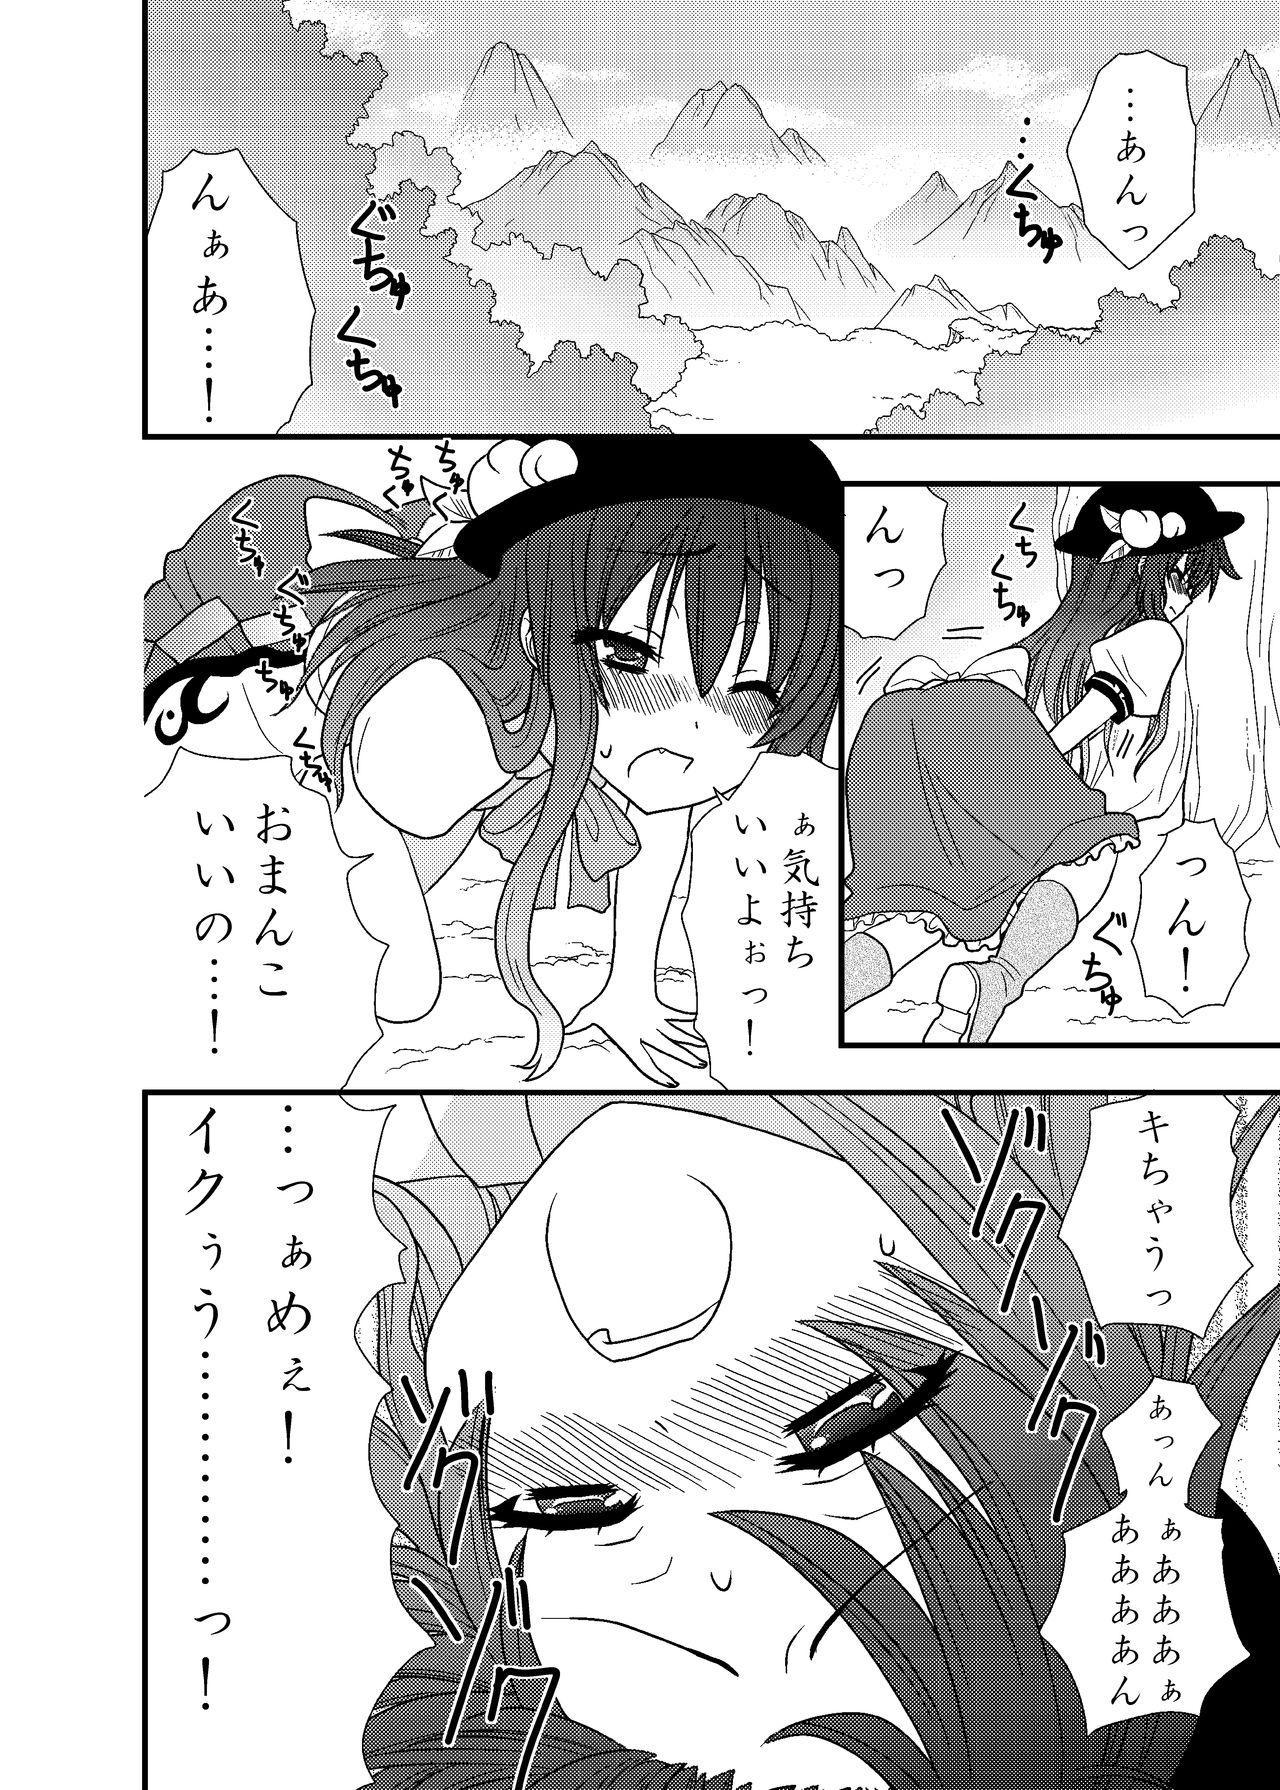 Tenko Hitori de Dekinai mon! 2